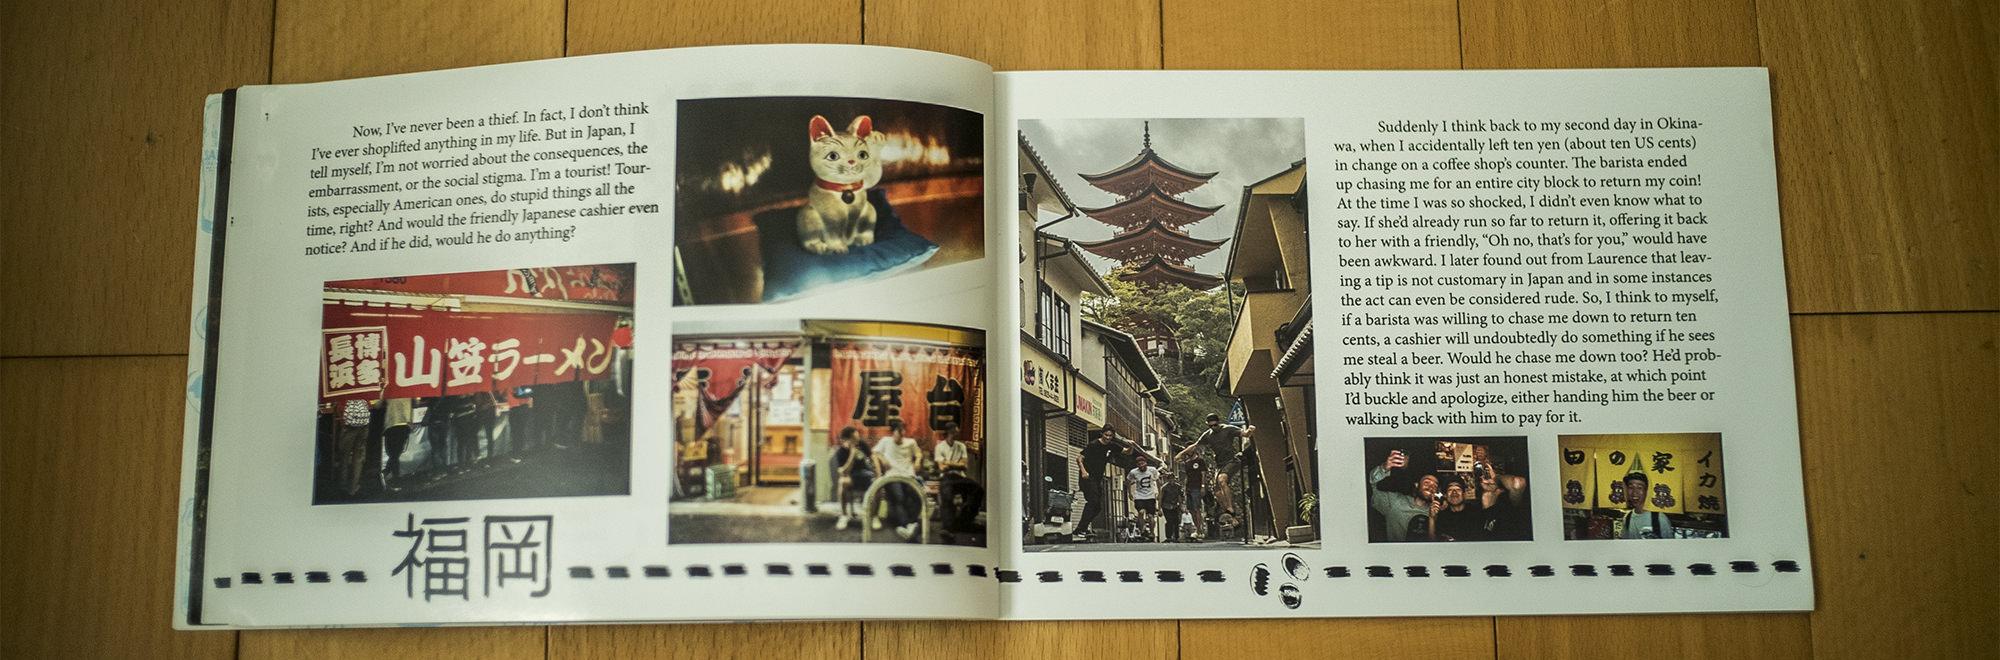 Old Friend Japan Page 08 LOWQ